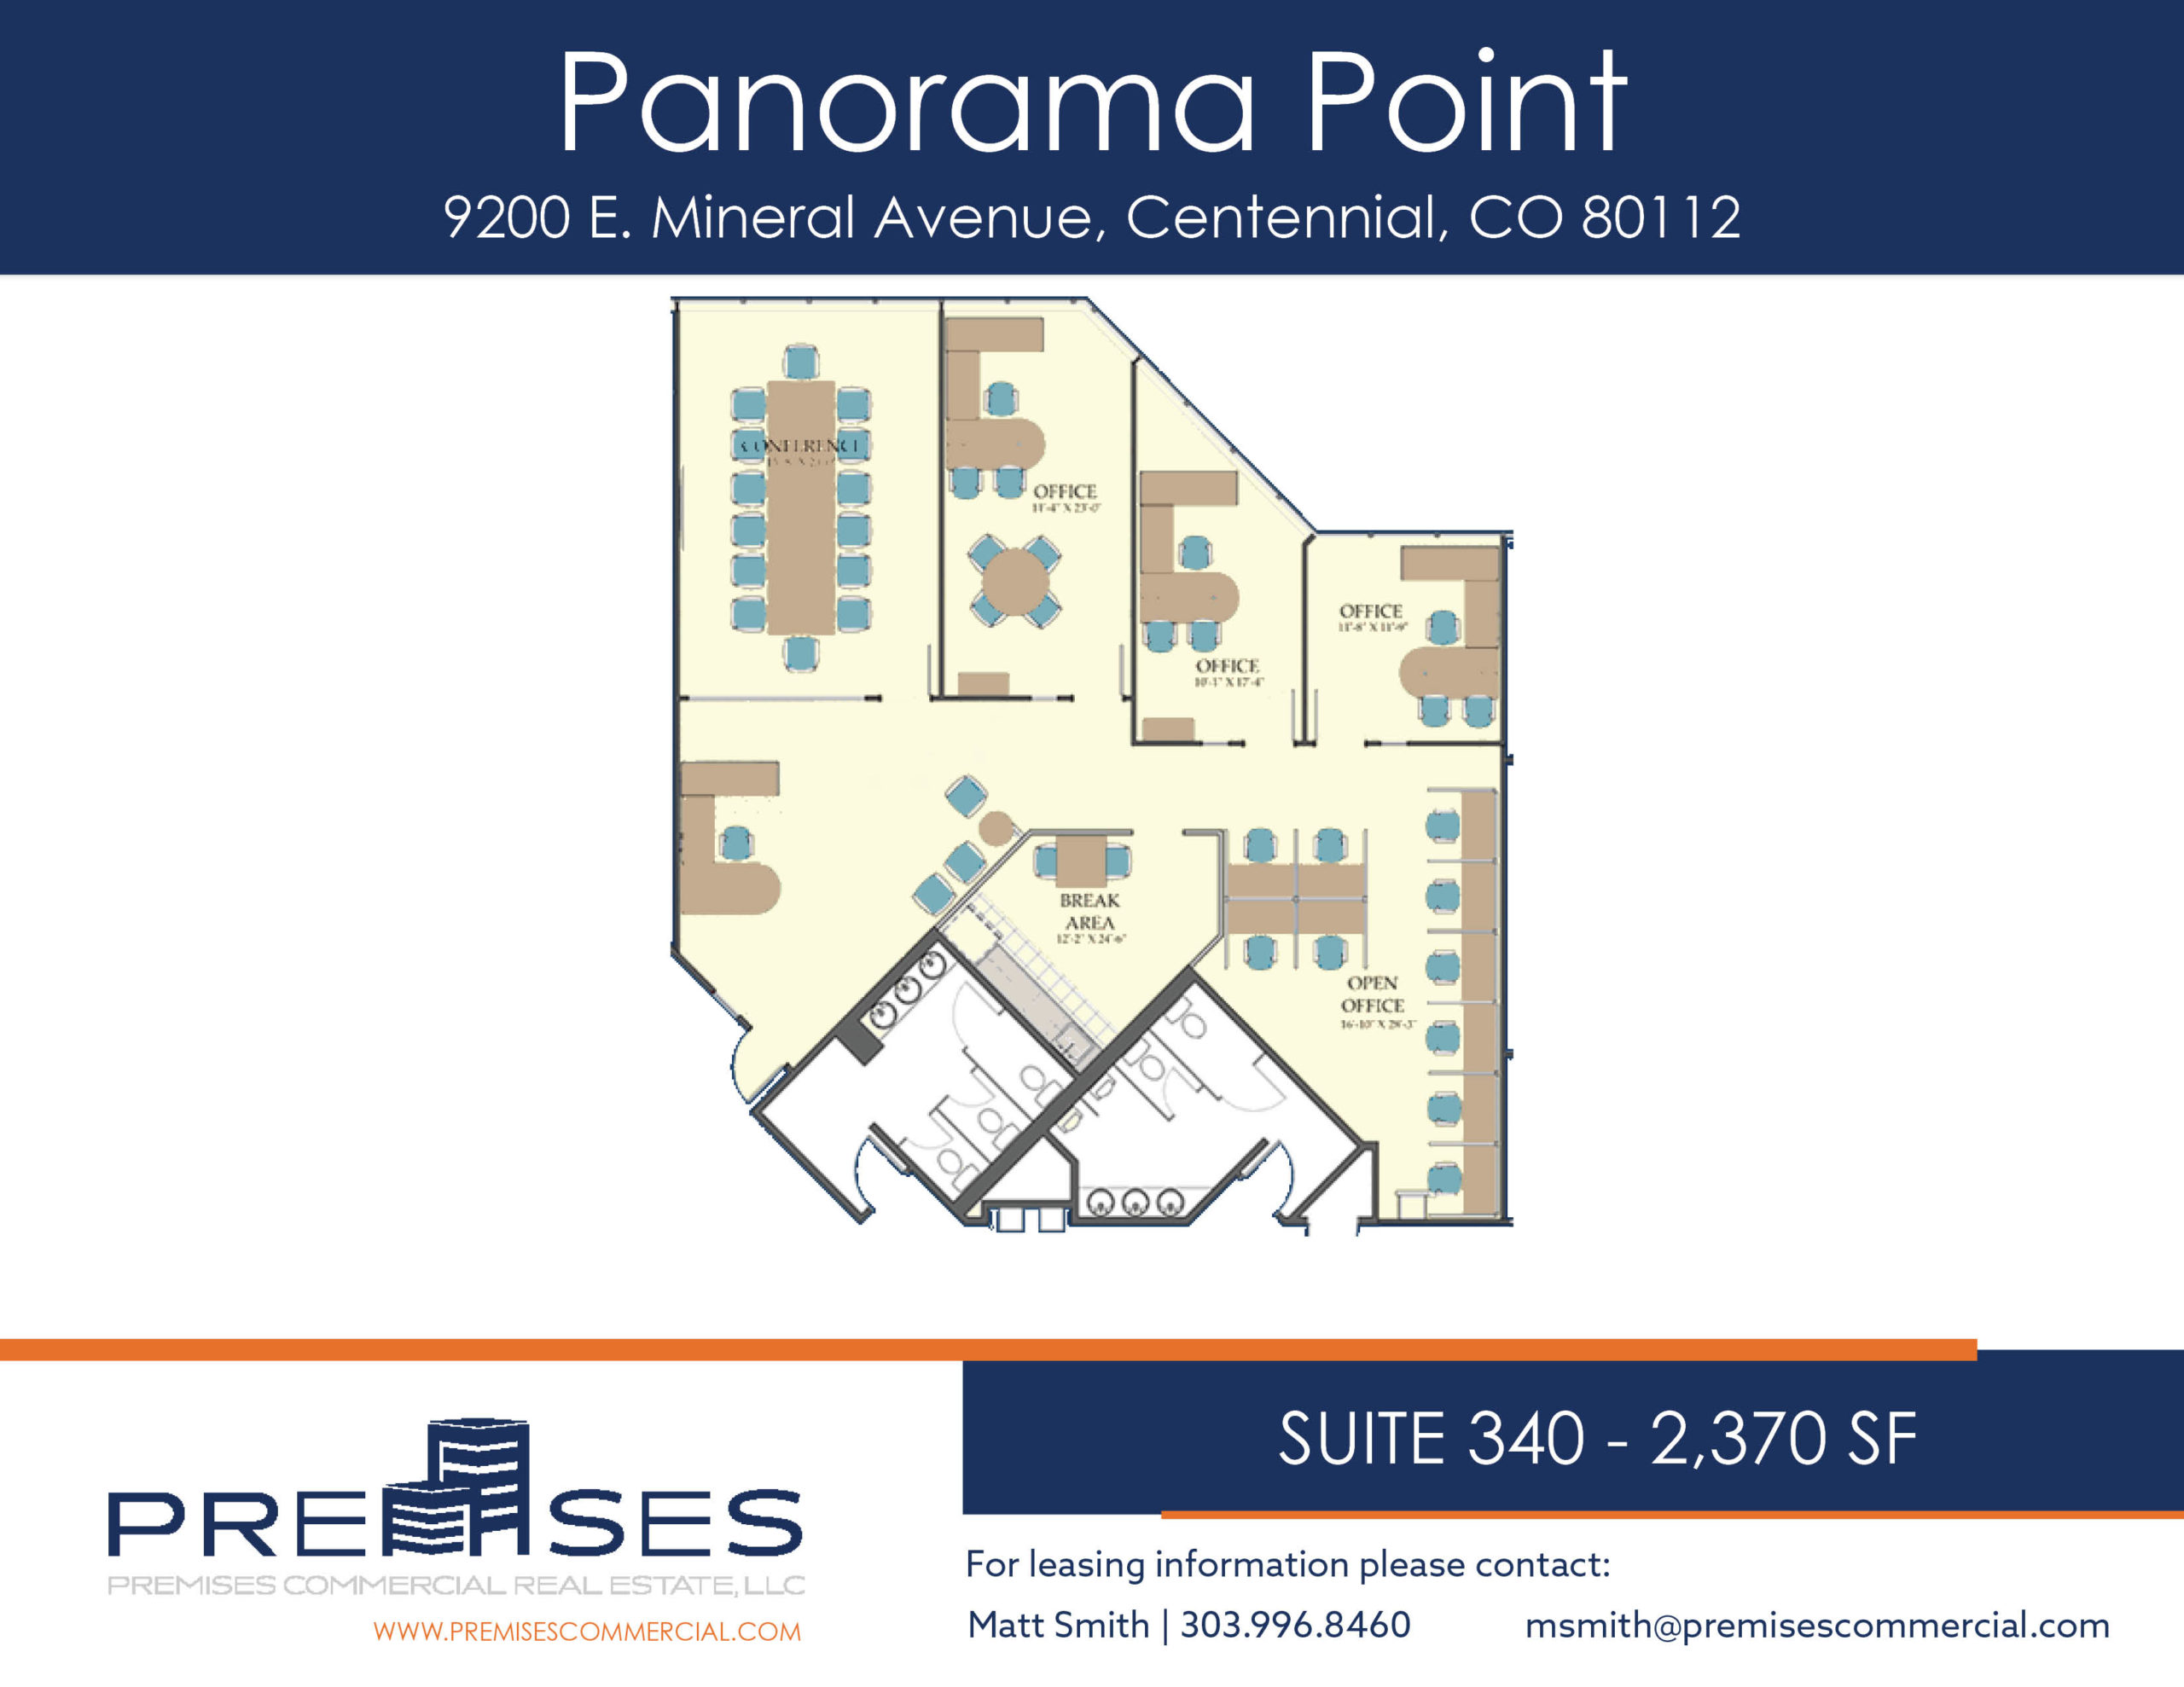 Suite 340 - 2,370 sf